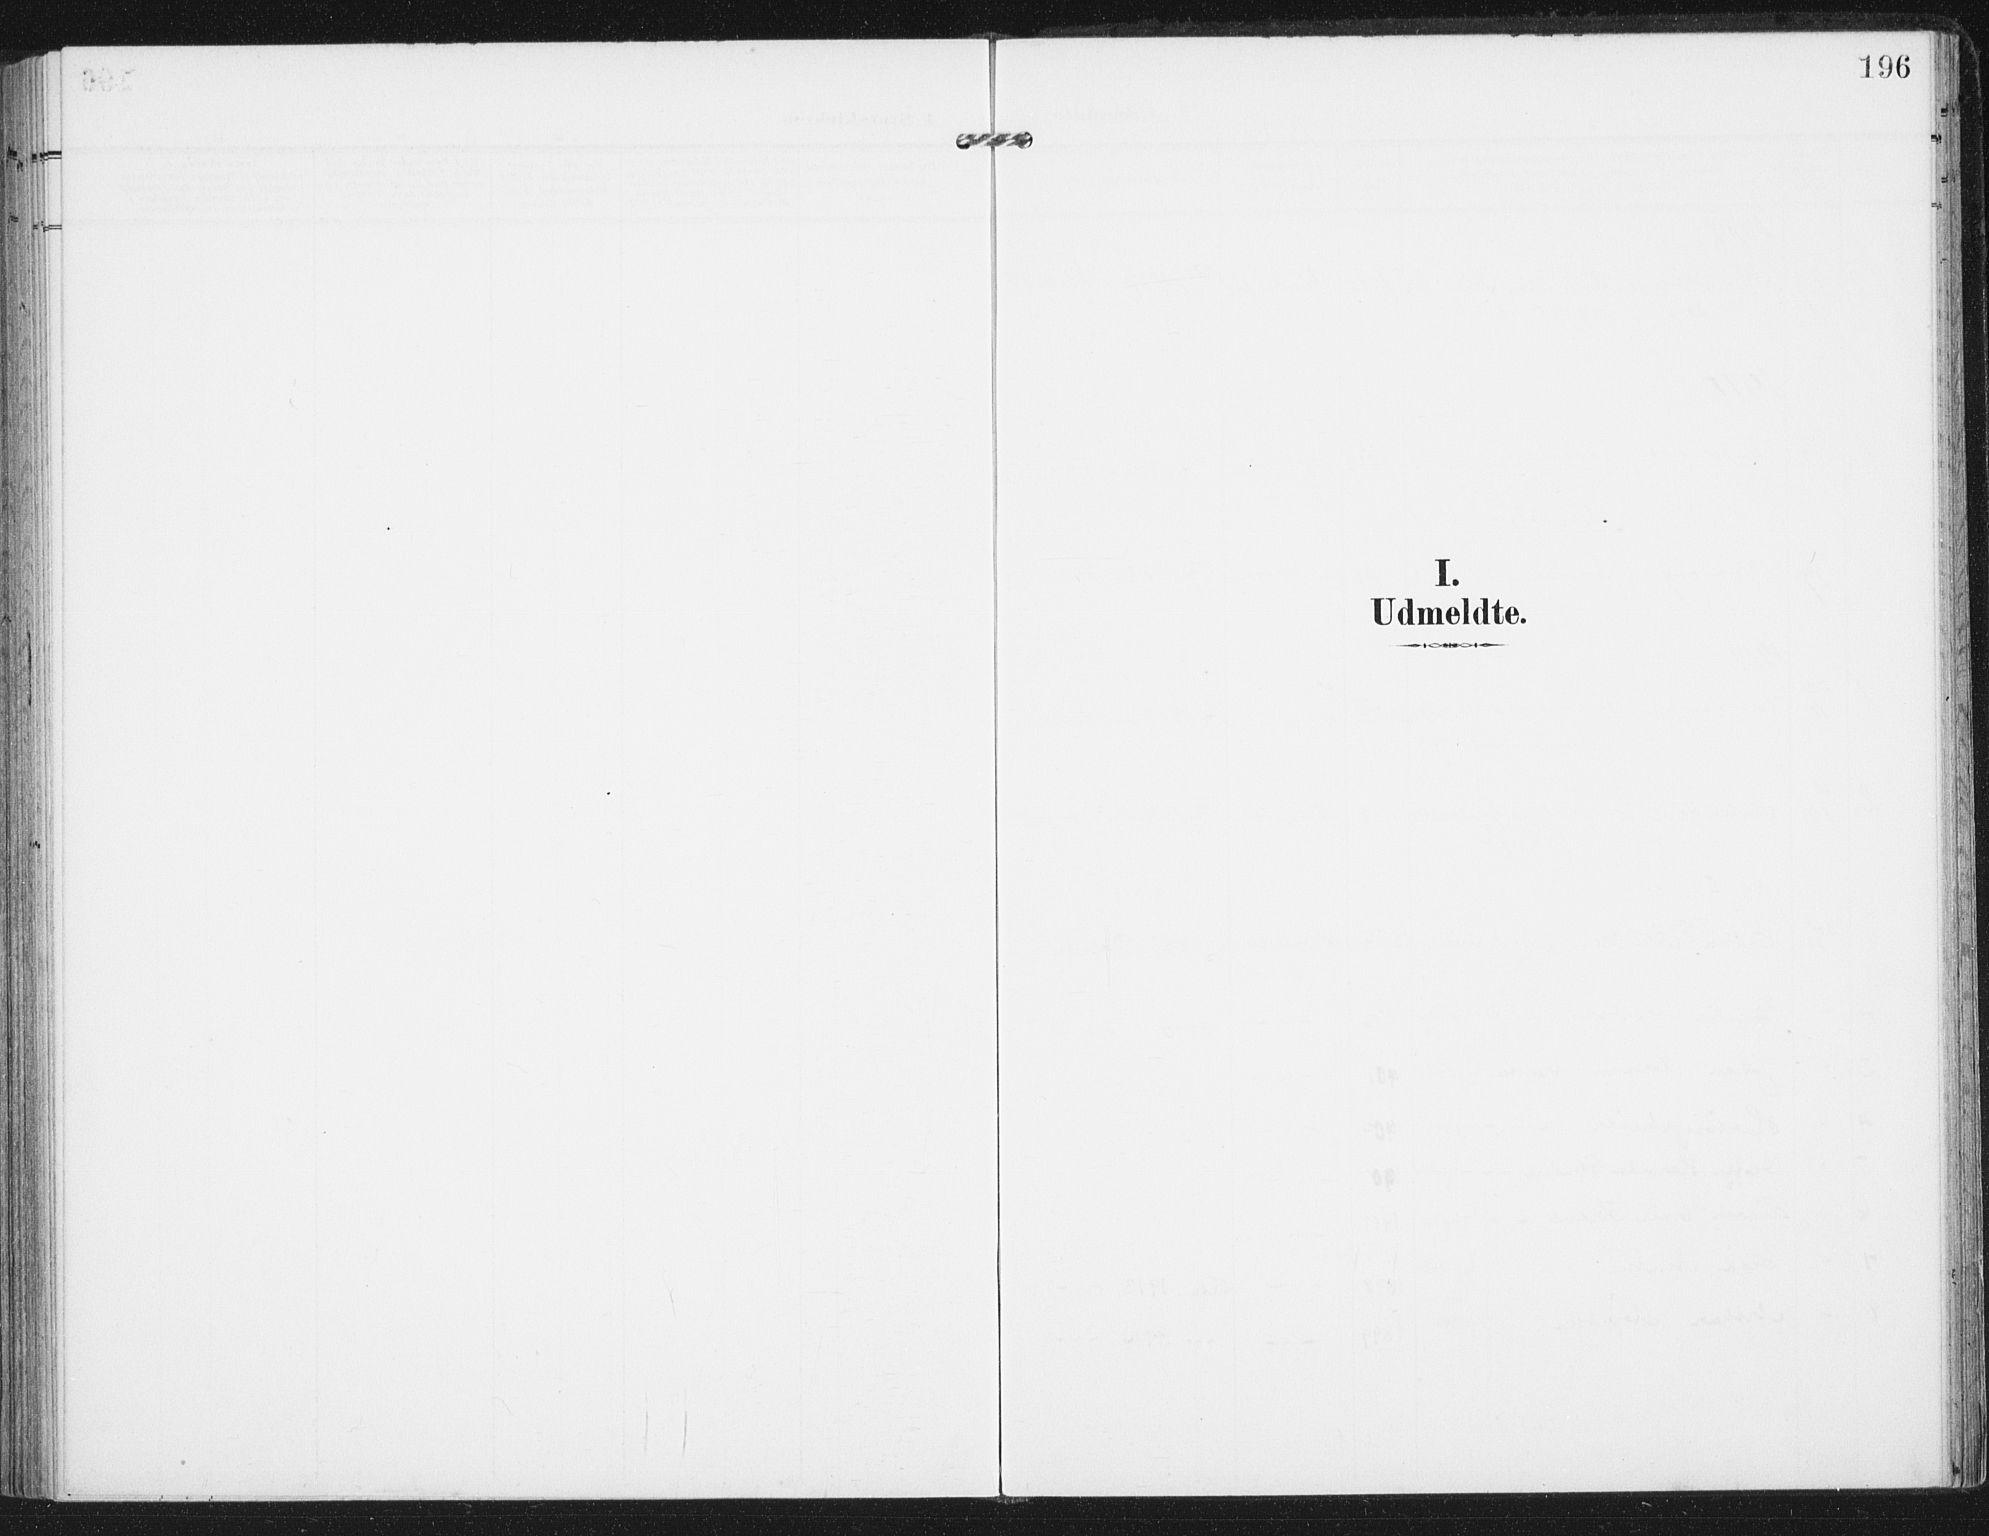 SAT, Ministerialprotokoller, klokkerbøker og fødselsregistre - Nordland, 885/L1206: Ministerialbok nr. 885A07, 1905-1915, s. 196